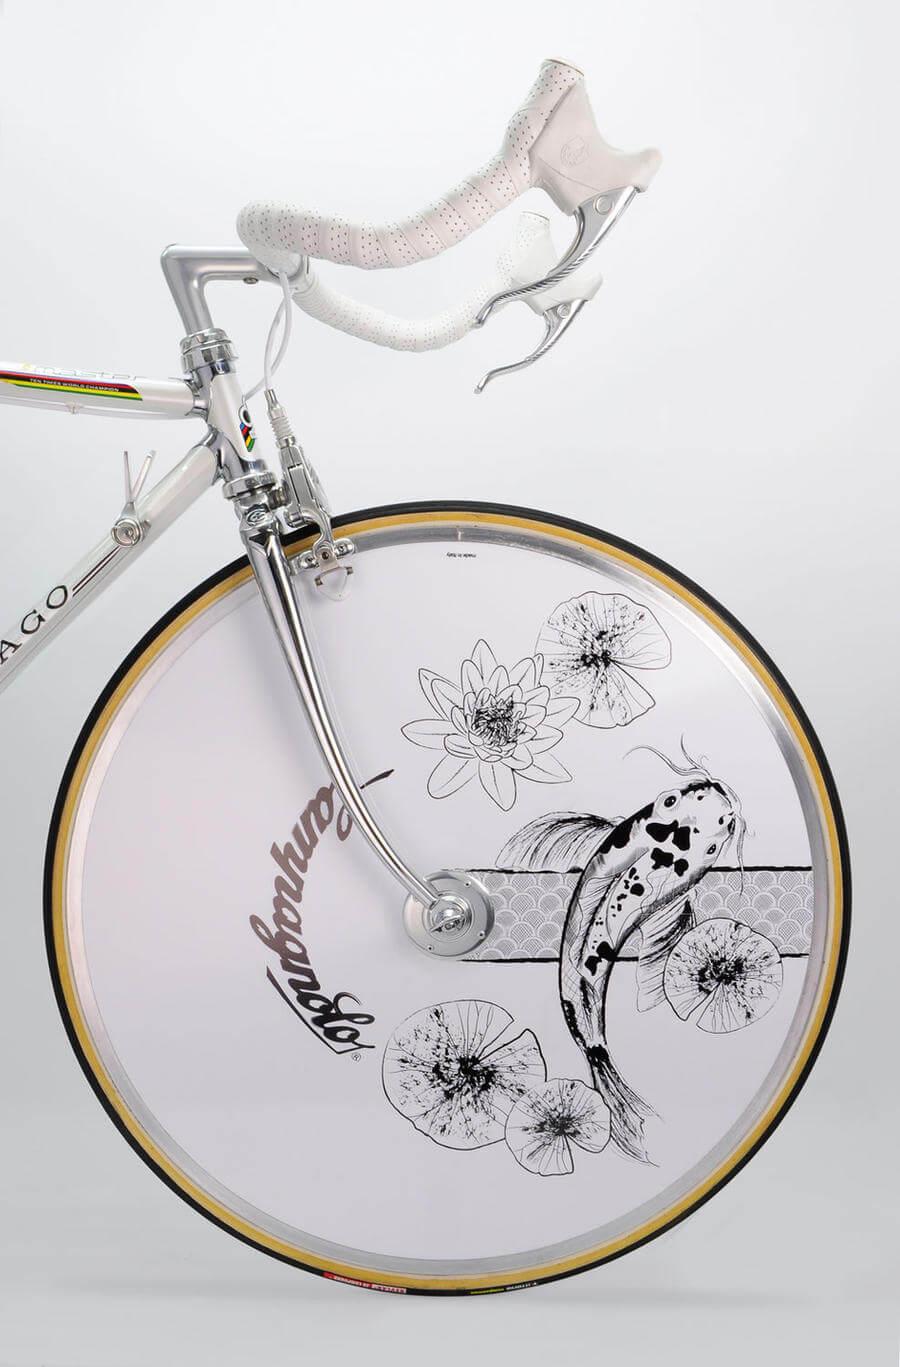 bicicleta customizada con elementos japoneses